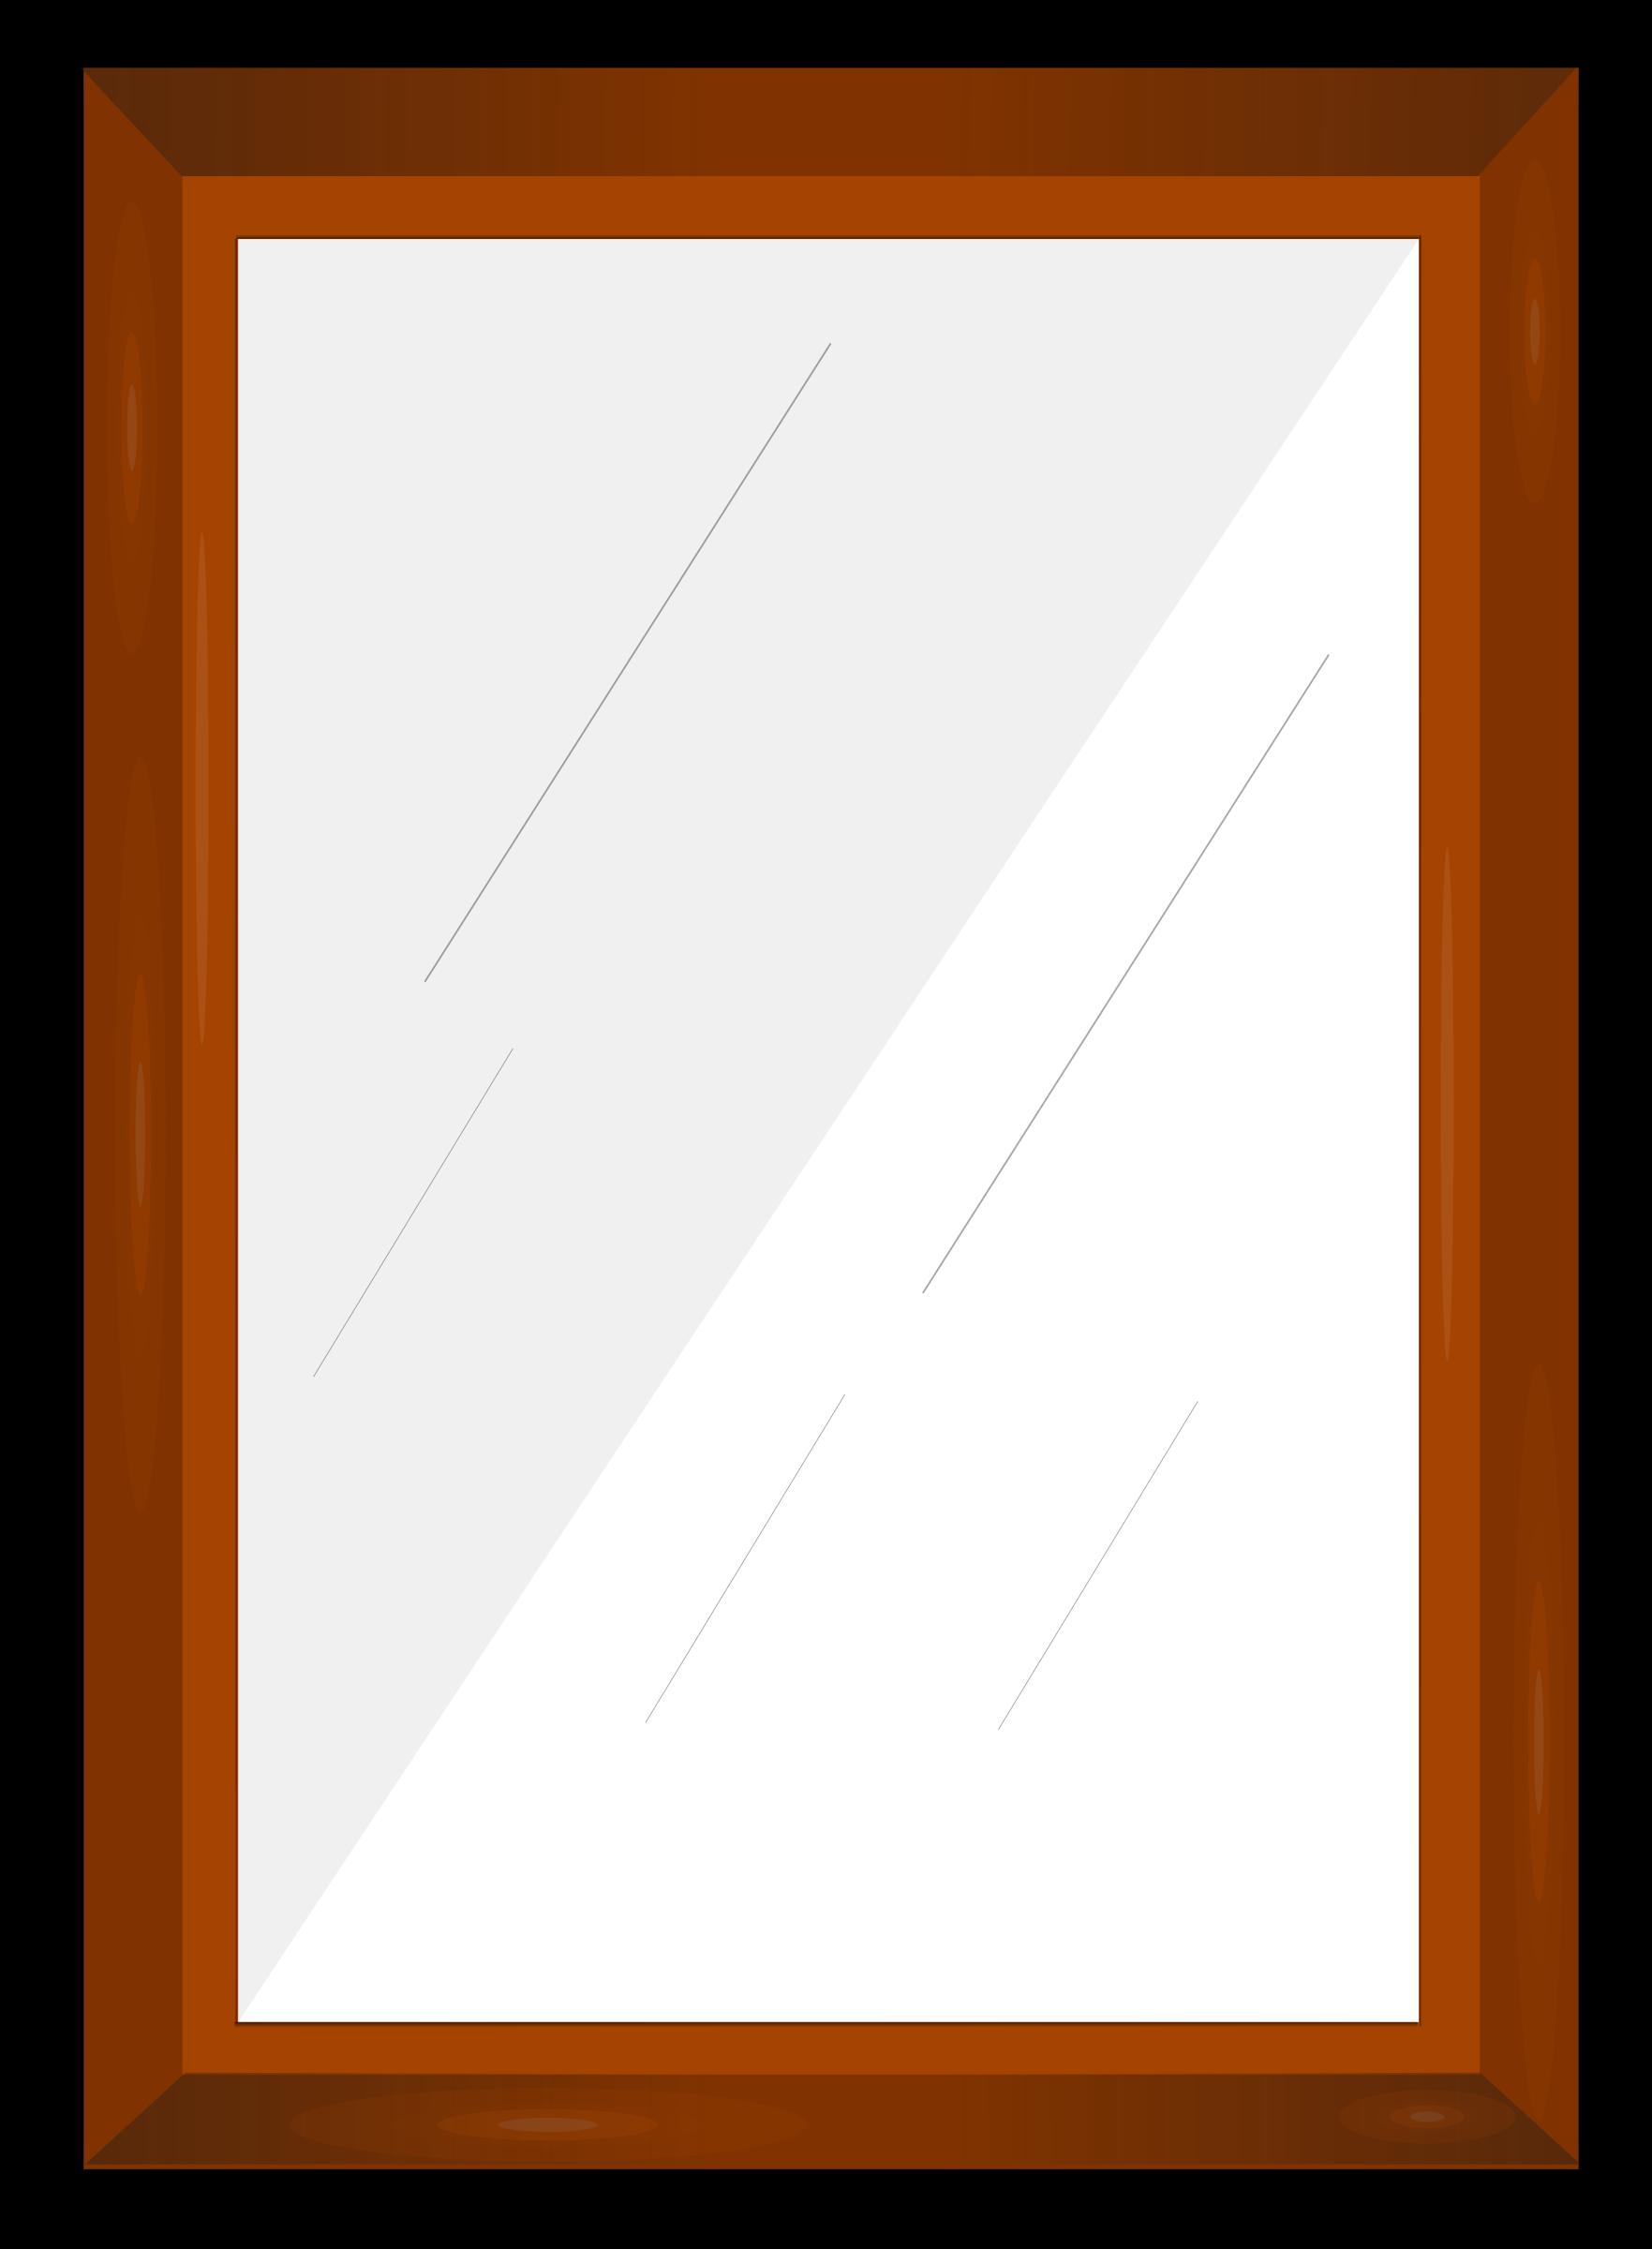 Frame big image png. Mirror clipart rectangular mirror